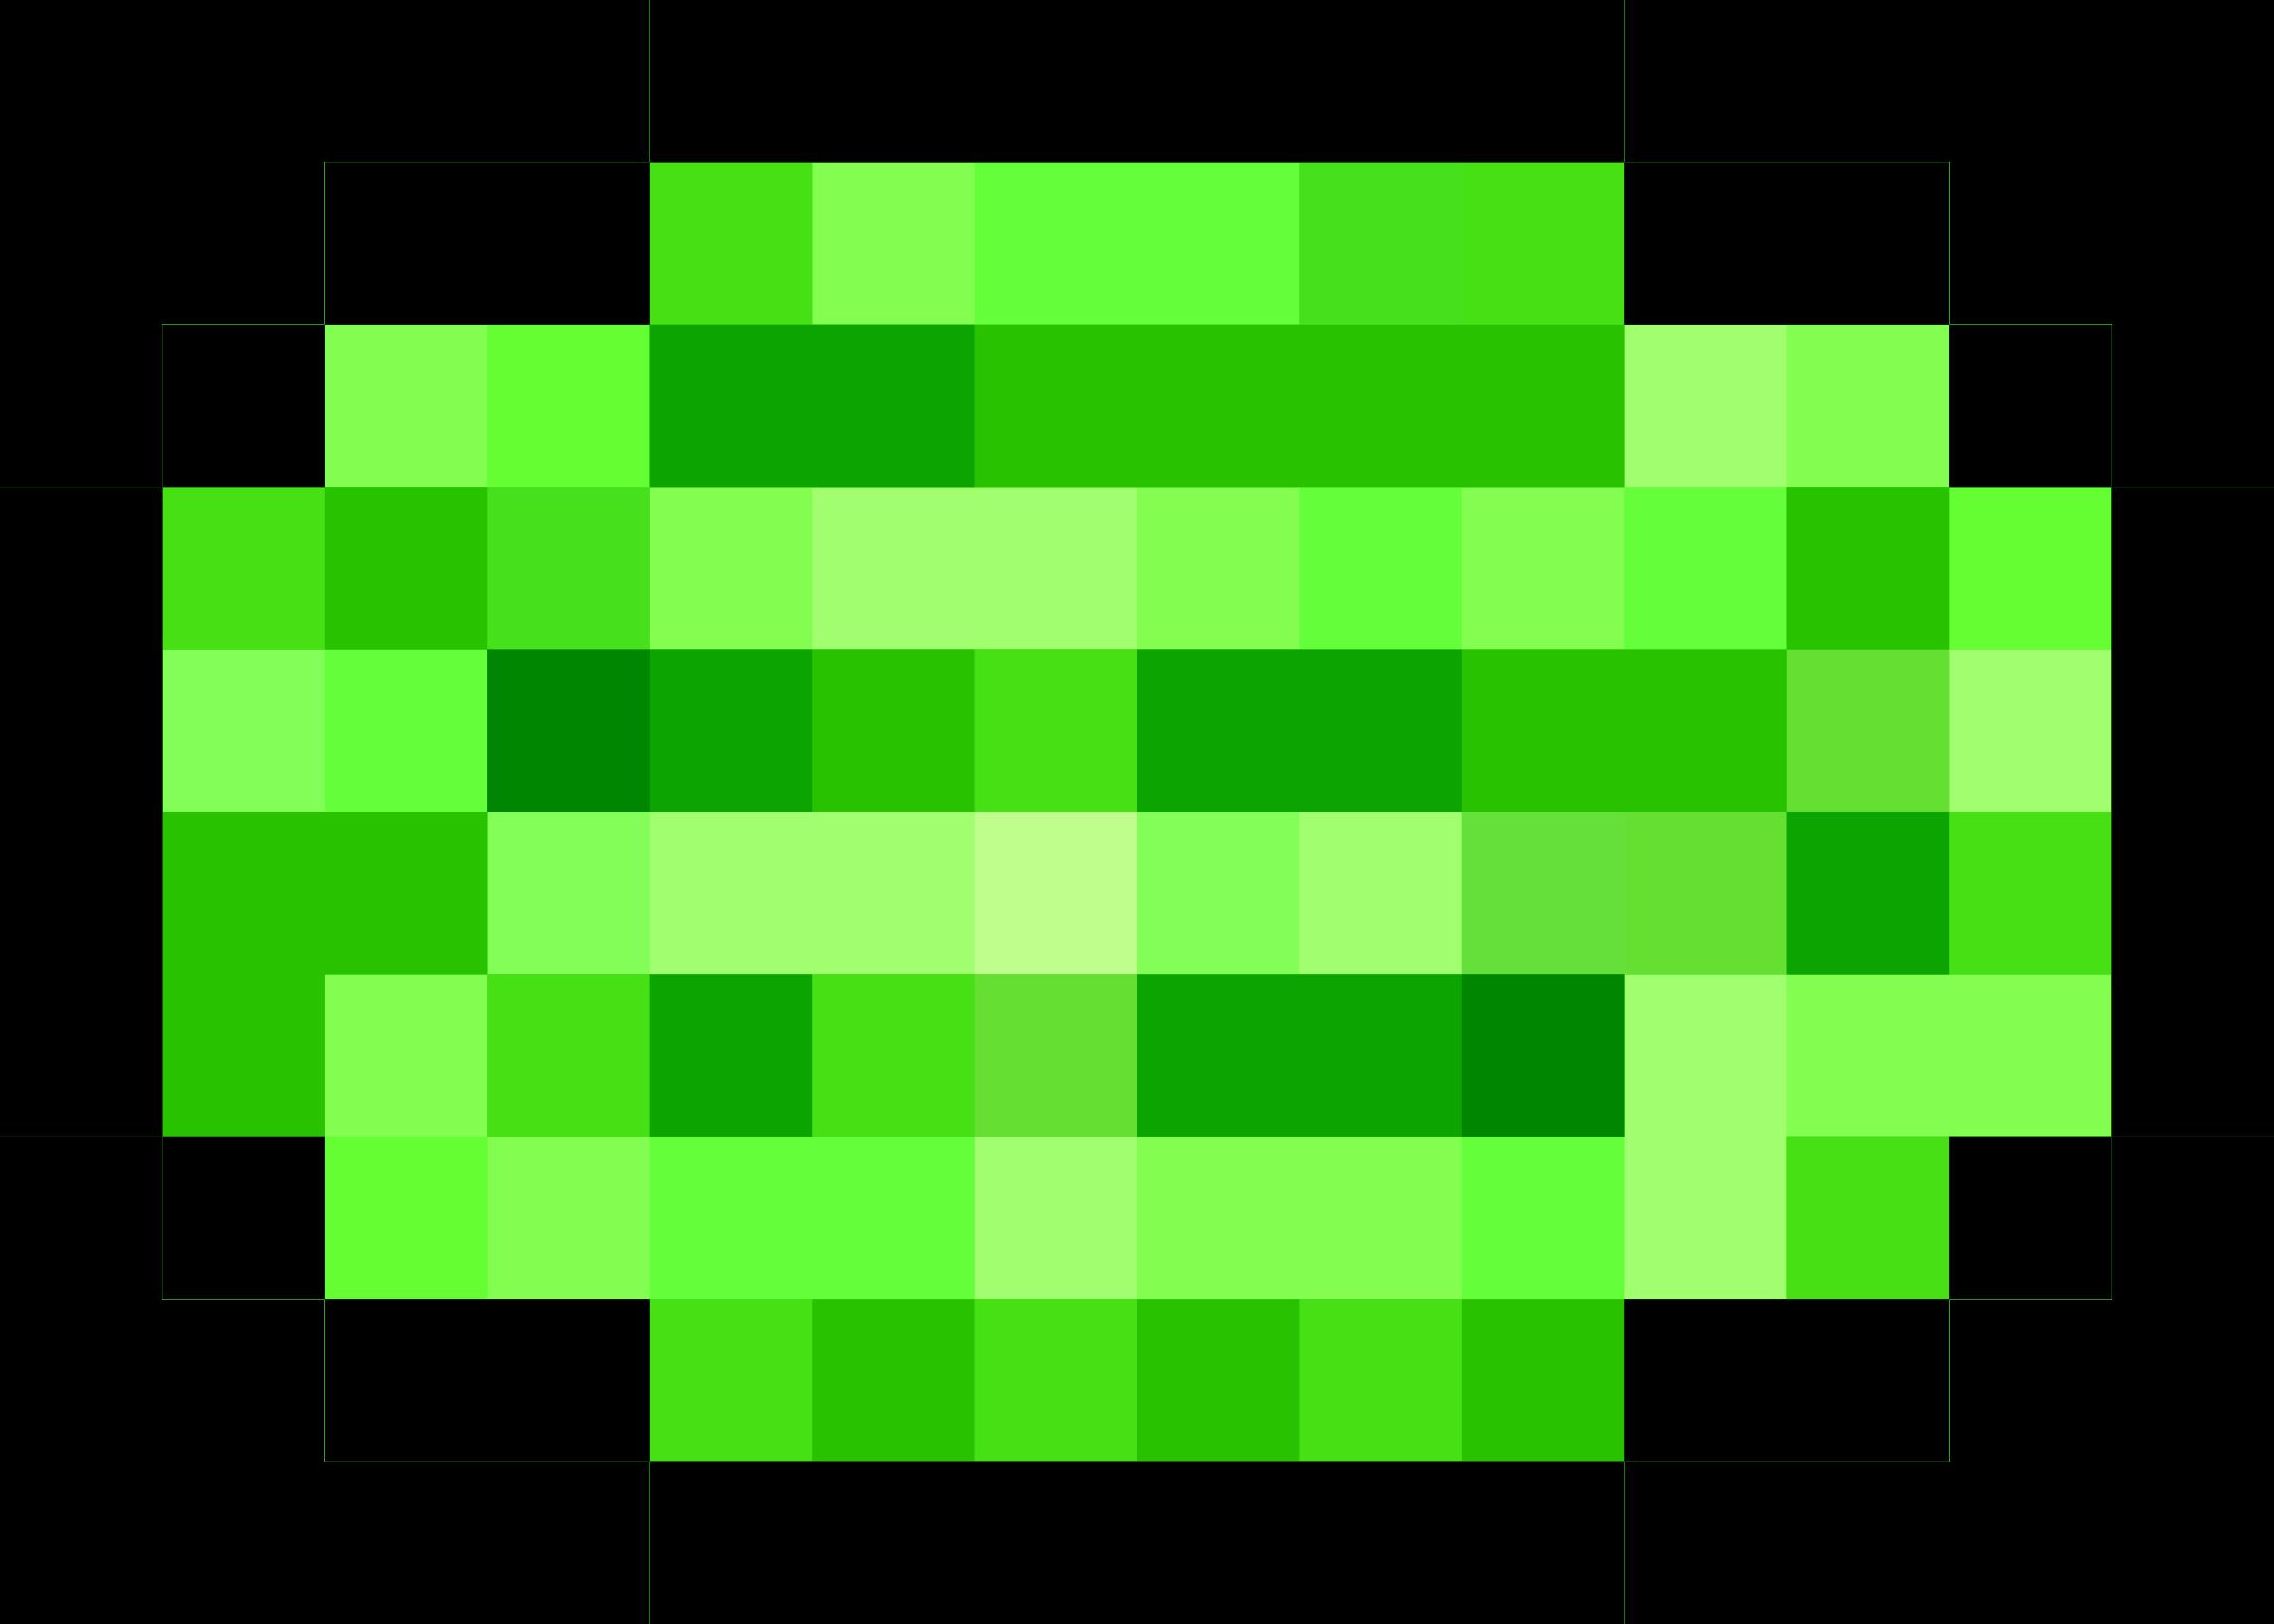 Pixel watermelon big image. Game clipart 8 bit